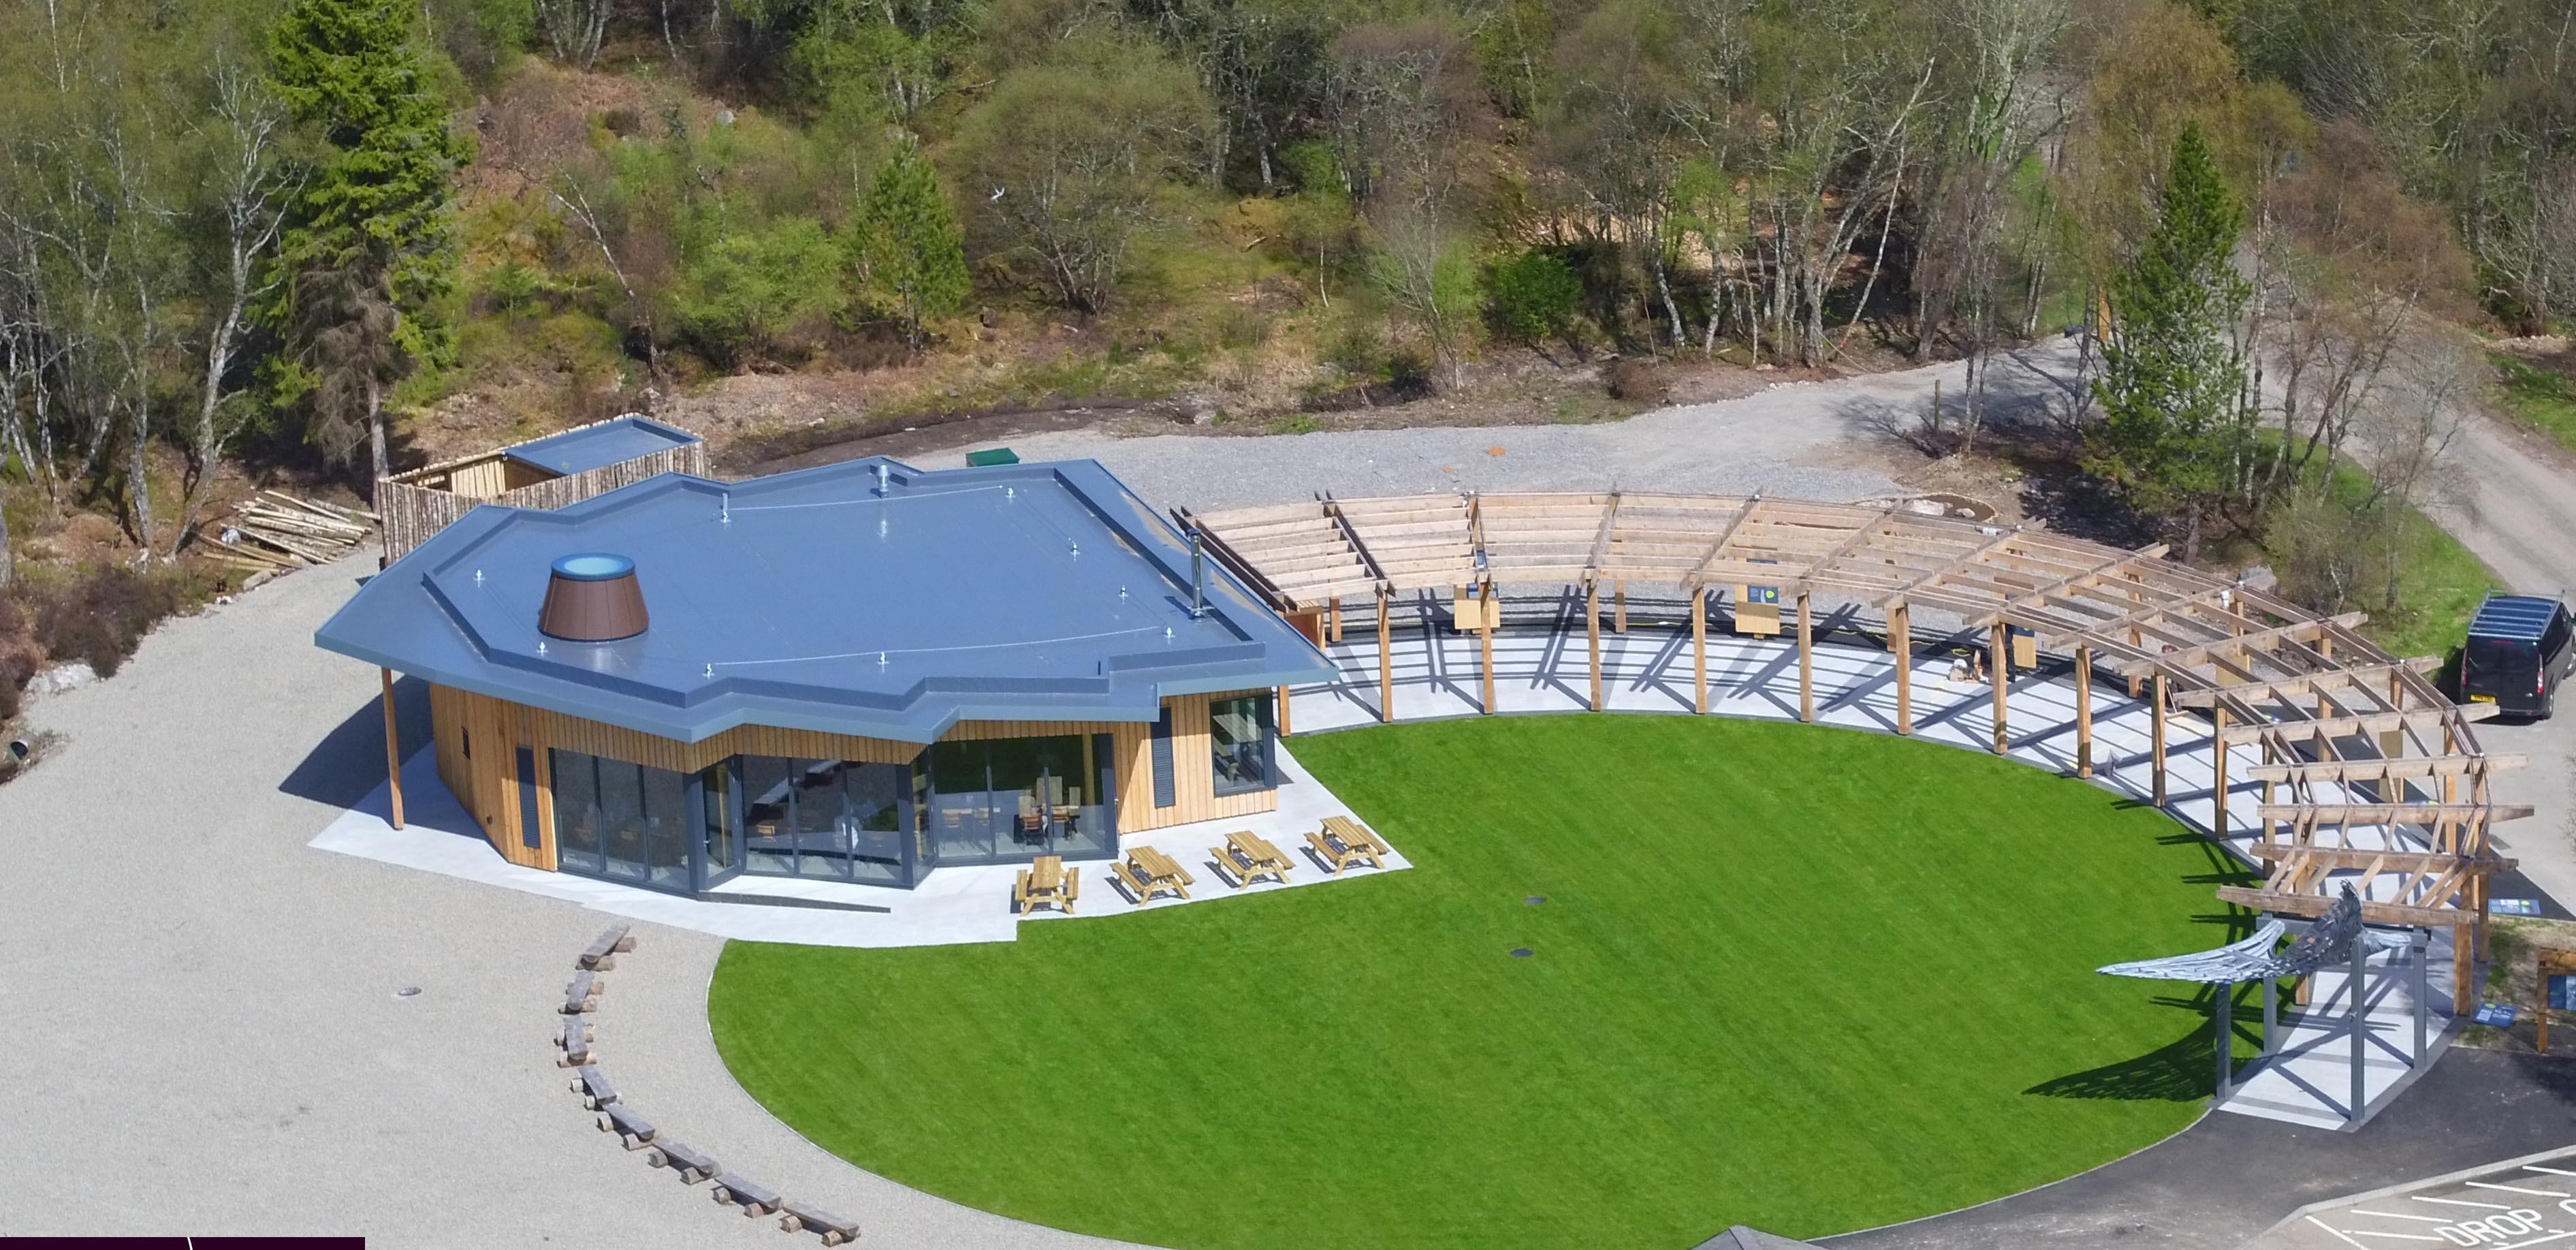 The new Falls of Shin visitor centre